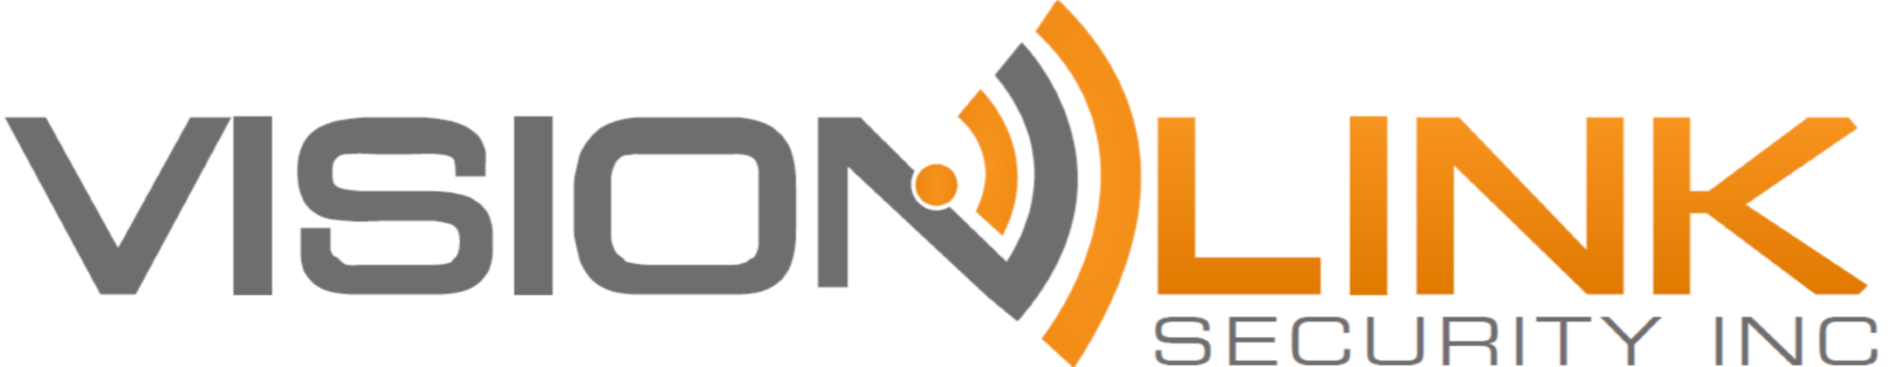 Vision Link Security Inc. Logo